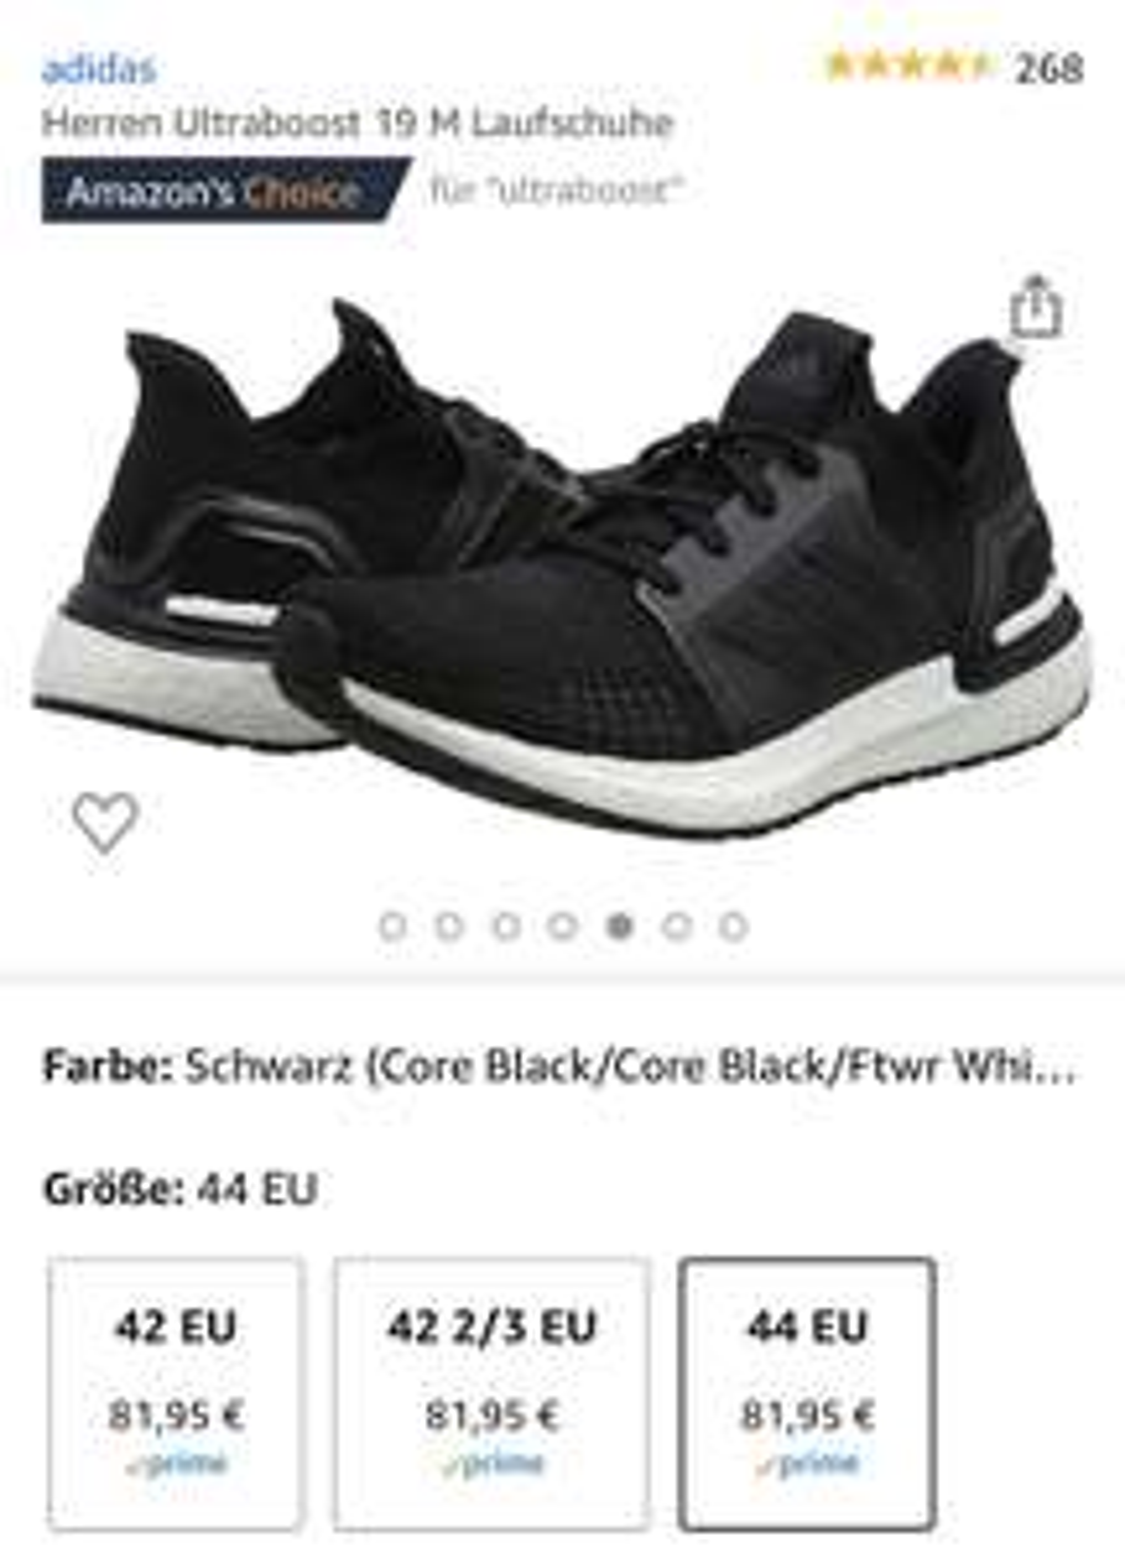 Adidas Ultraboost Herren - Schwarz 42, 42 1/3, 44